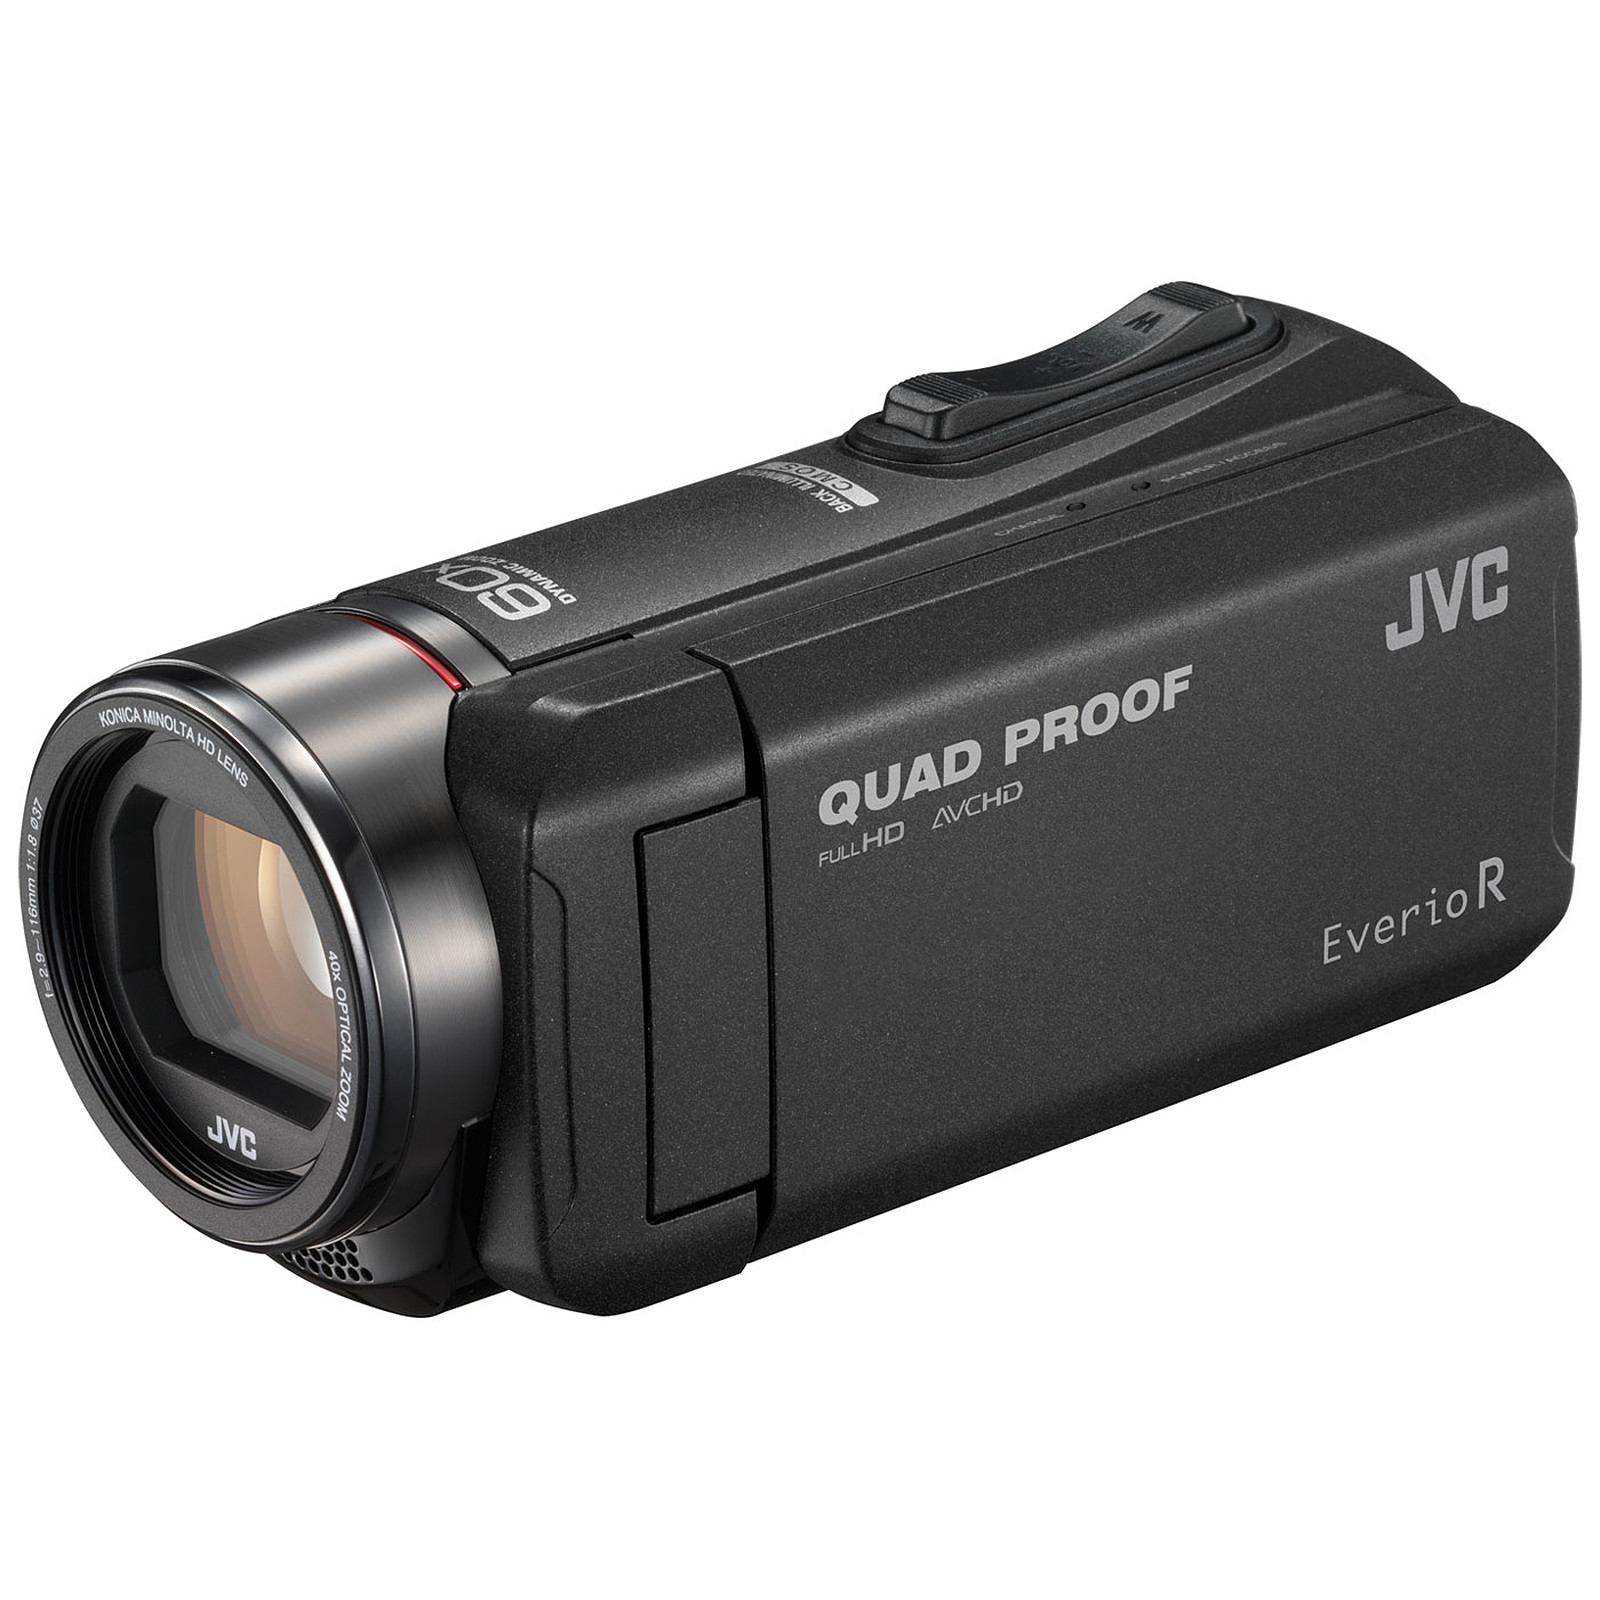 JVC GZ-R405 Noir + carte mémoire SD 8 Go